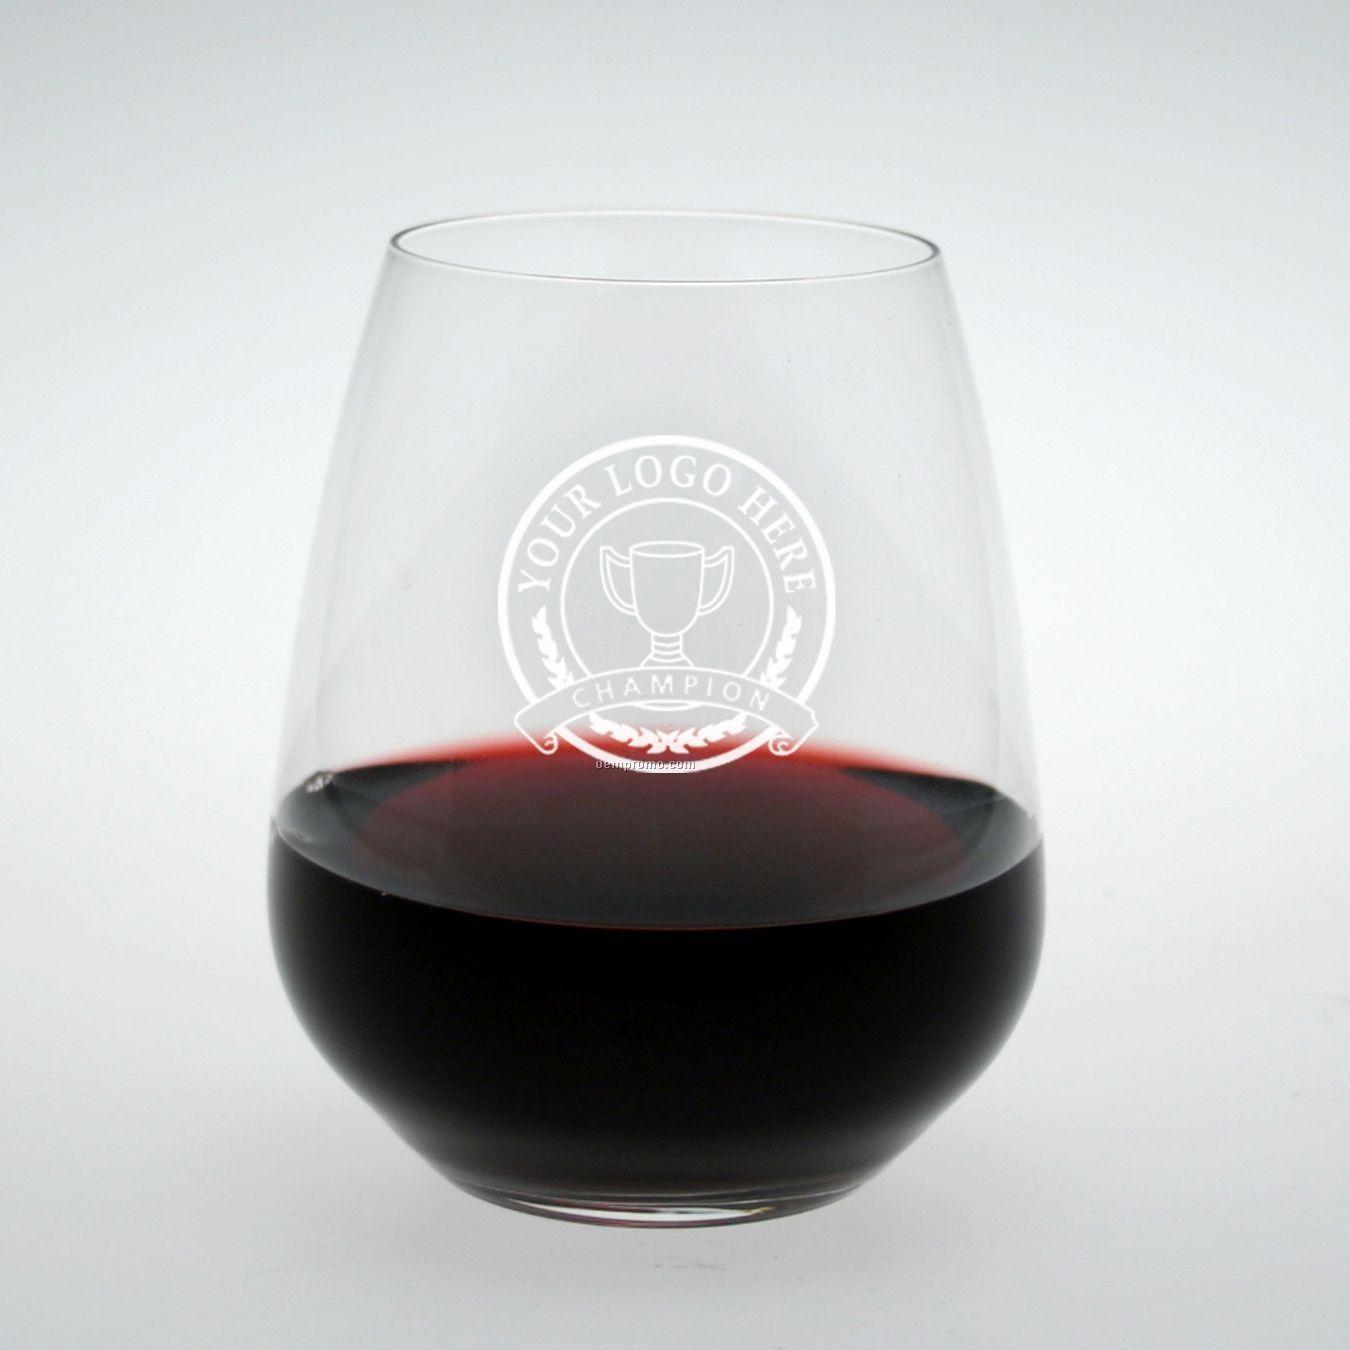 Studio Stemless Burgundy/ Pinot Noir Glass (Set Of 4 - Light Etch)